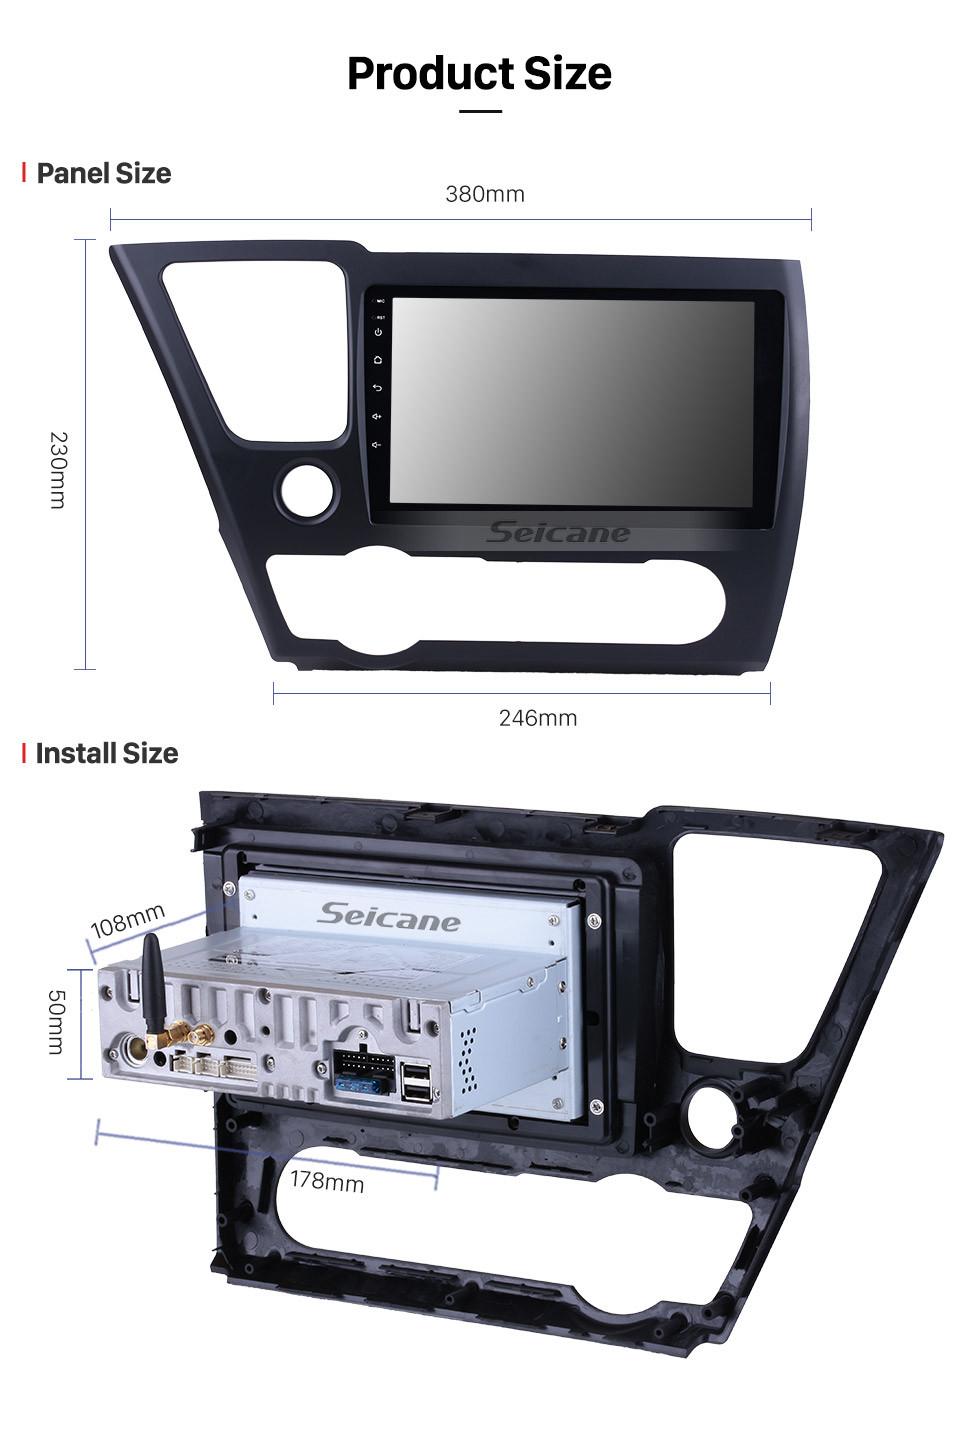 Seicane 2014 2015 2016 2017 Honda Civic Android 9.0 HD Touchscreen 9 inch car stereo GPS Navigation Radio Bluetooth Mirror link OBD DVR Rear view camera TV USB Carplay